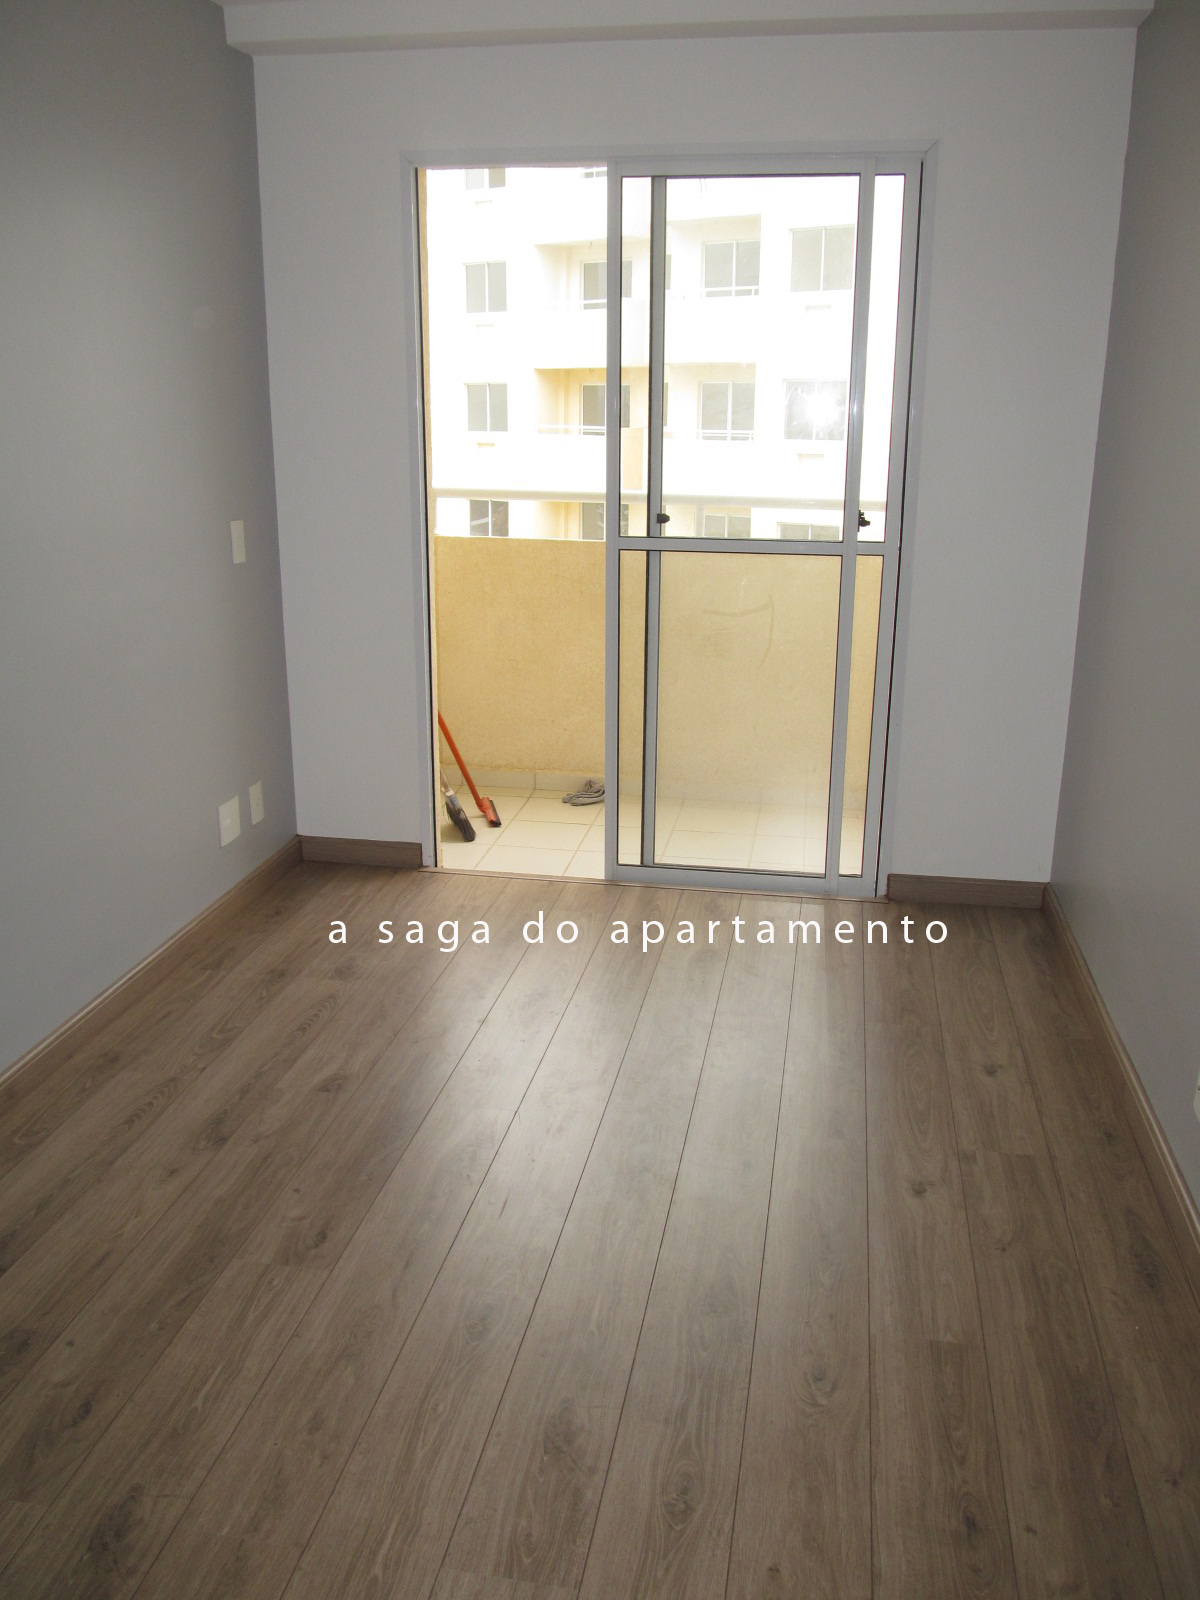 A saga do piso parte 5 laminado finalmente instalado for Piso laminado instalado